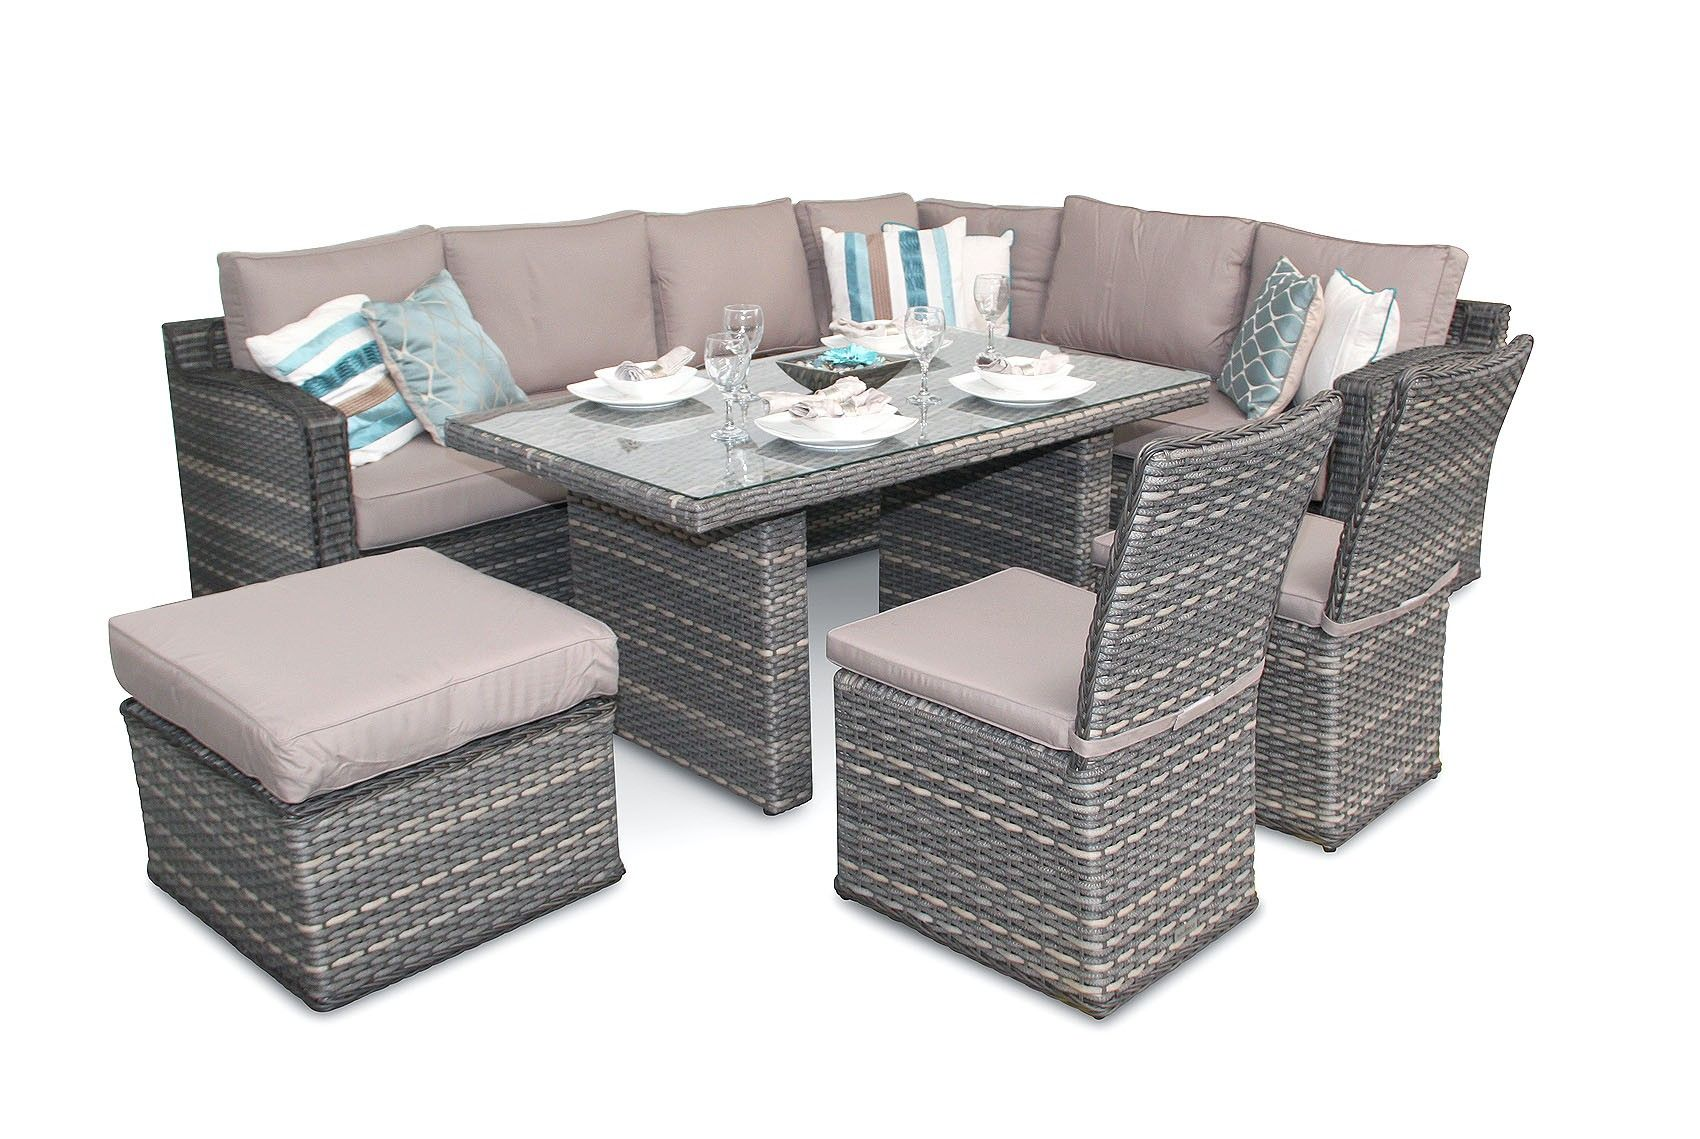 Chelsea Rattan Sofa Corner Dining Set - LH & RH Arrangement ...